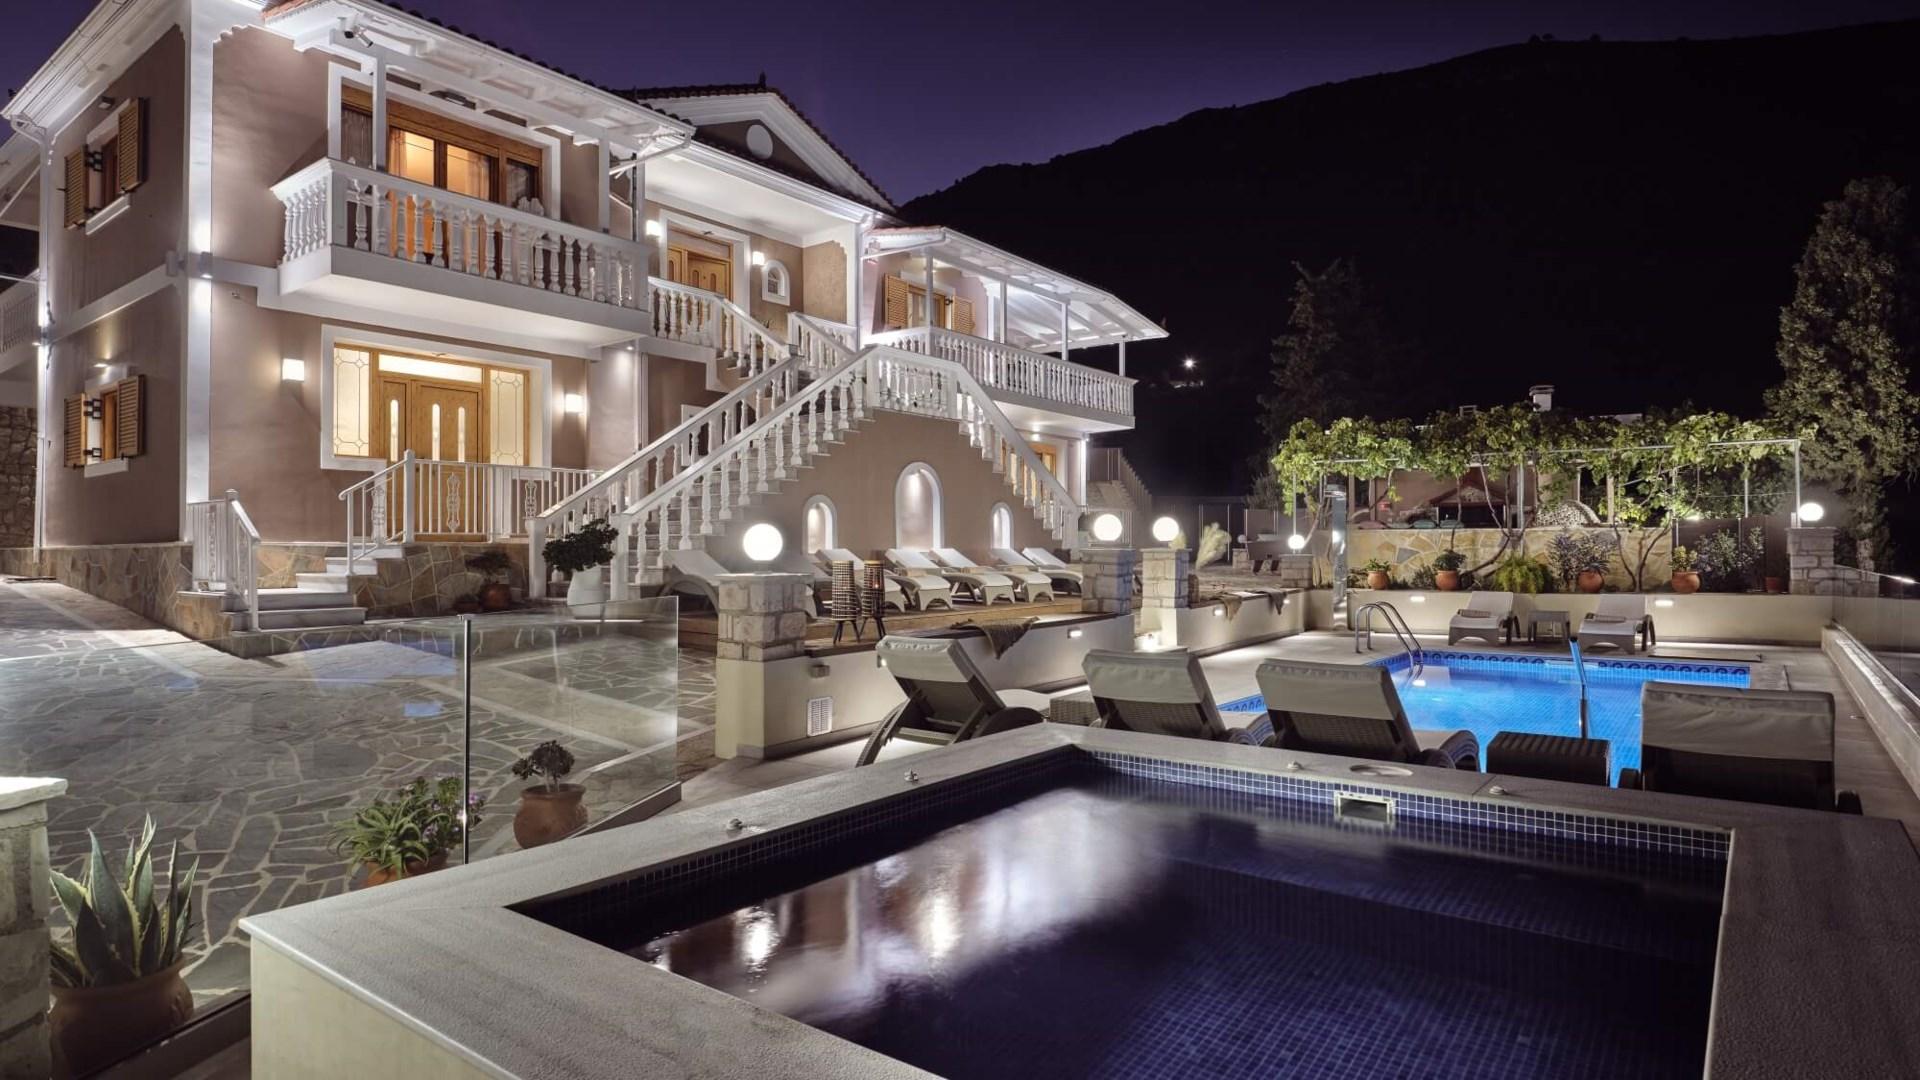 Lithakia Balcony Villa Zante Zakynthos Greece